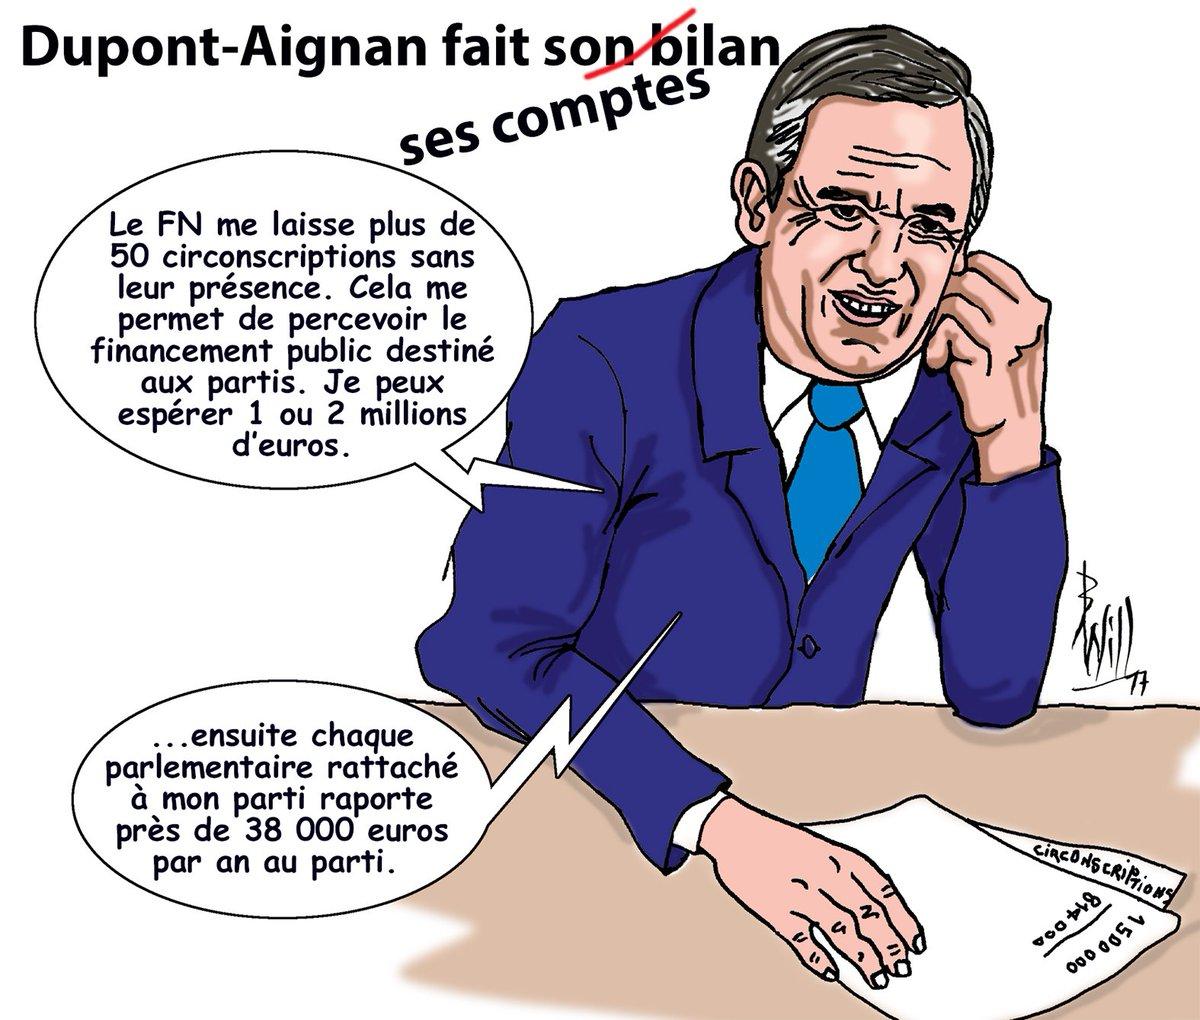 #Presidentielles2017 #Dupont-Aignan pic.twitter.com/LTv3MJ6vmu